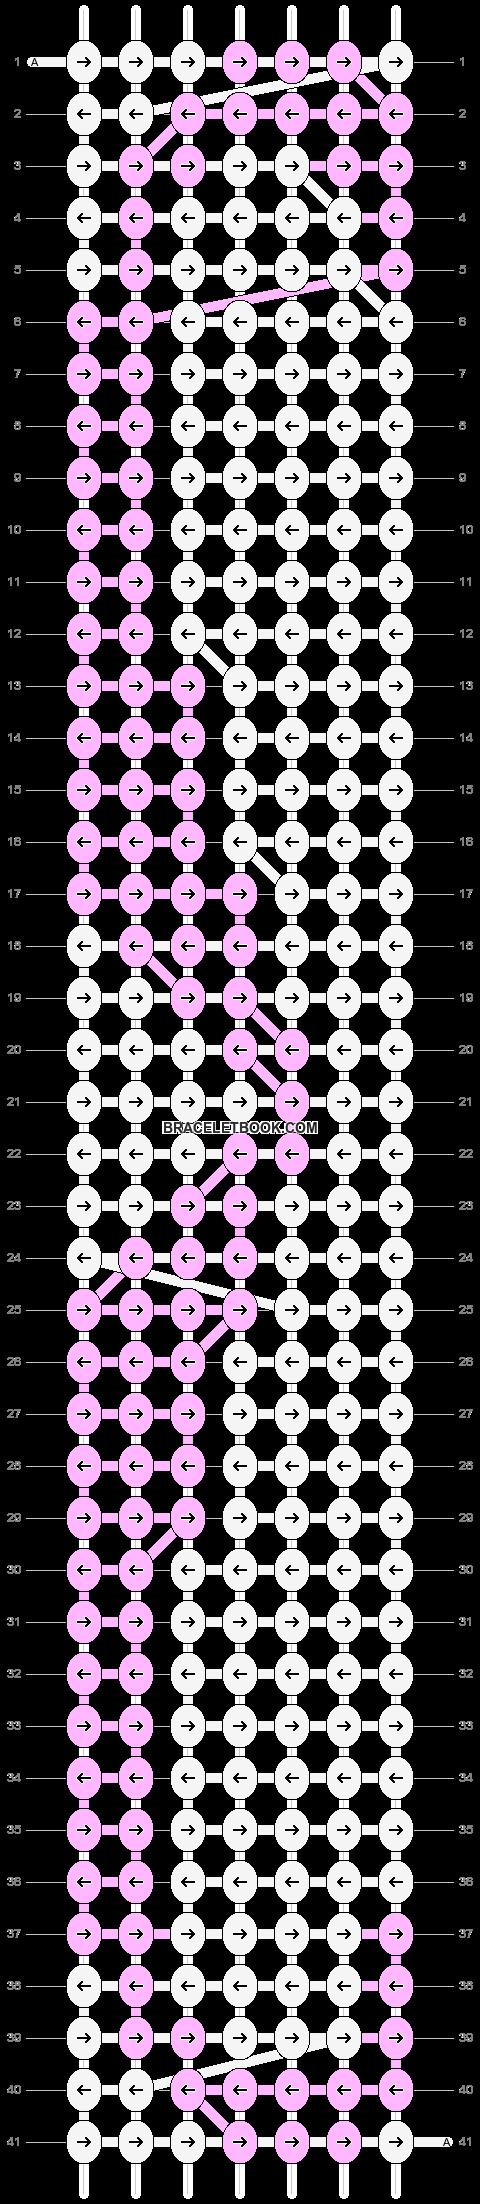 Alpha pattern #5397 pattern